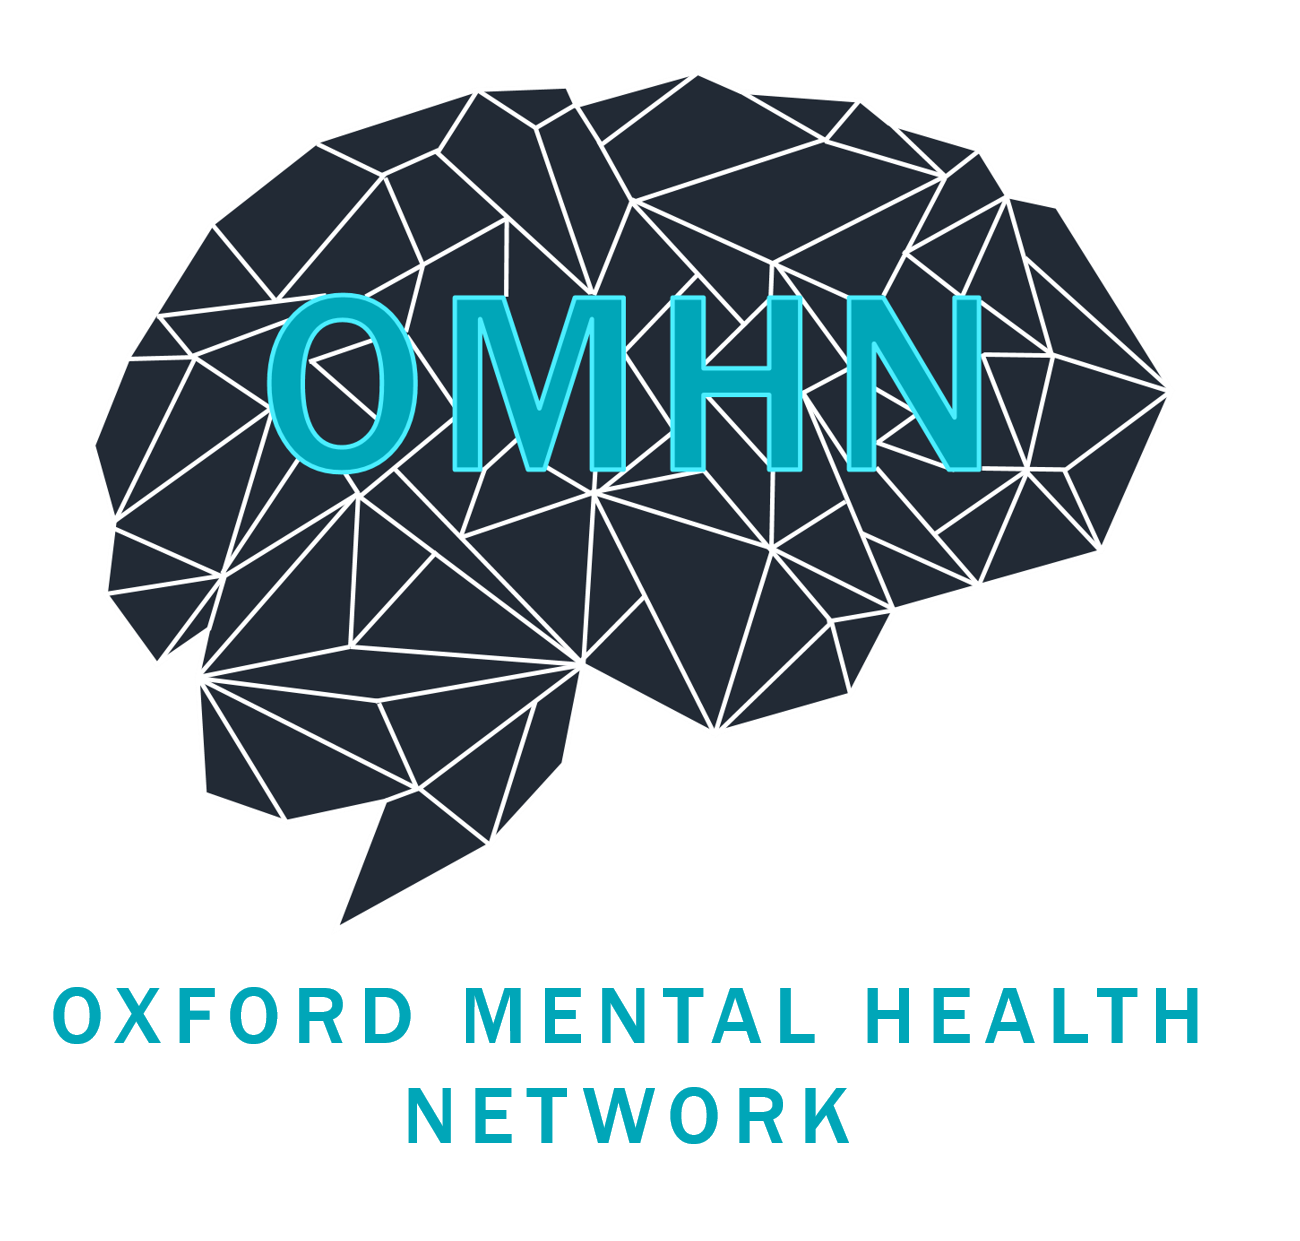 Omhn logo with text pjyydk